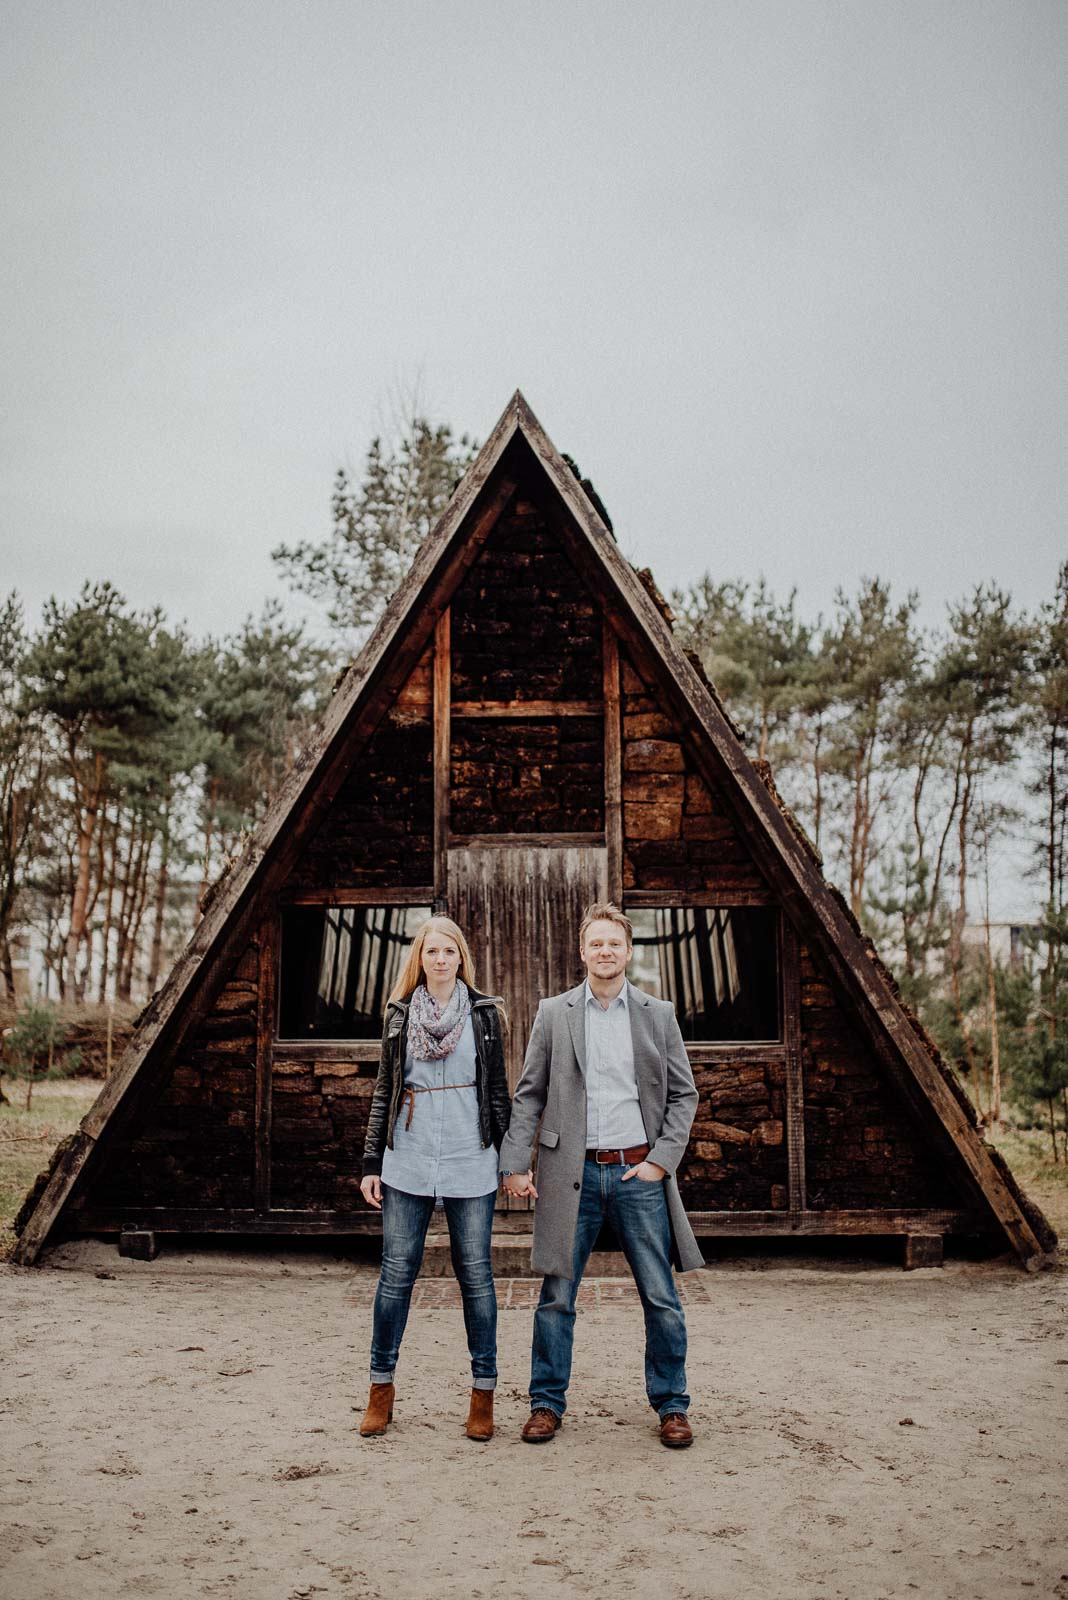 048-verlobungsshooting-engagement-fotograf-witten-rombergpark-dortmund